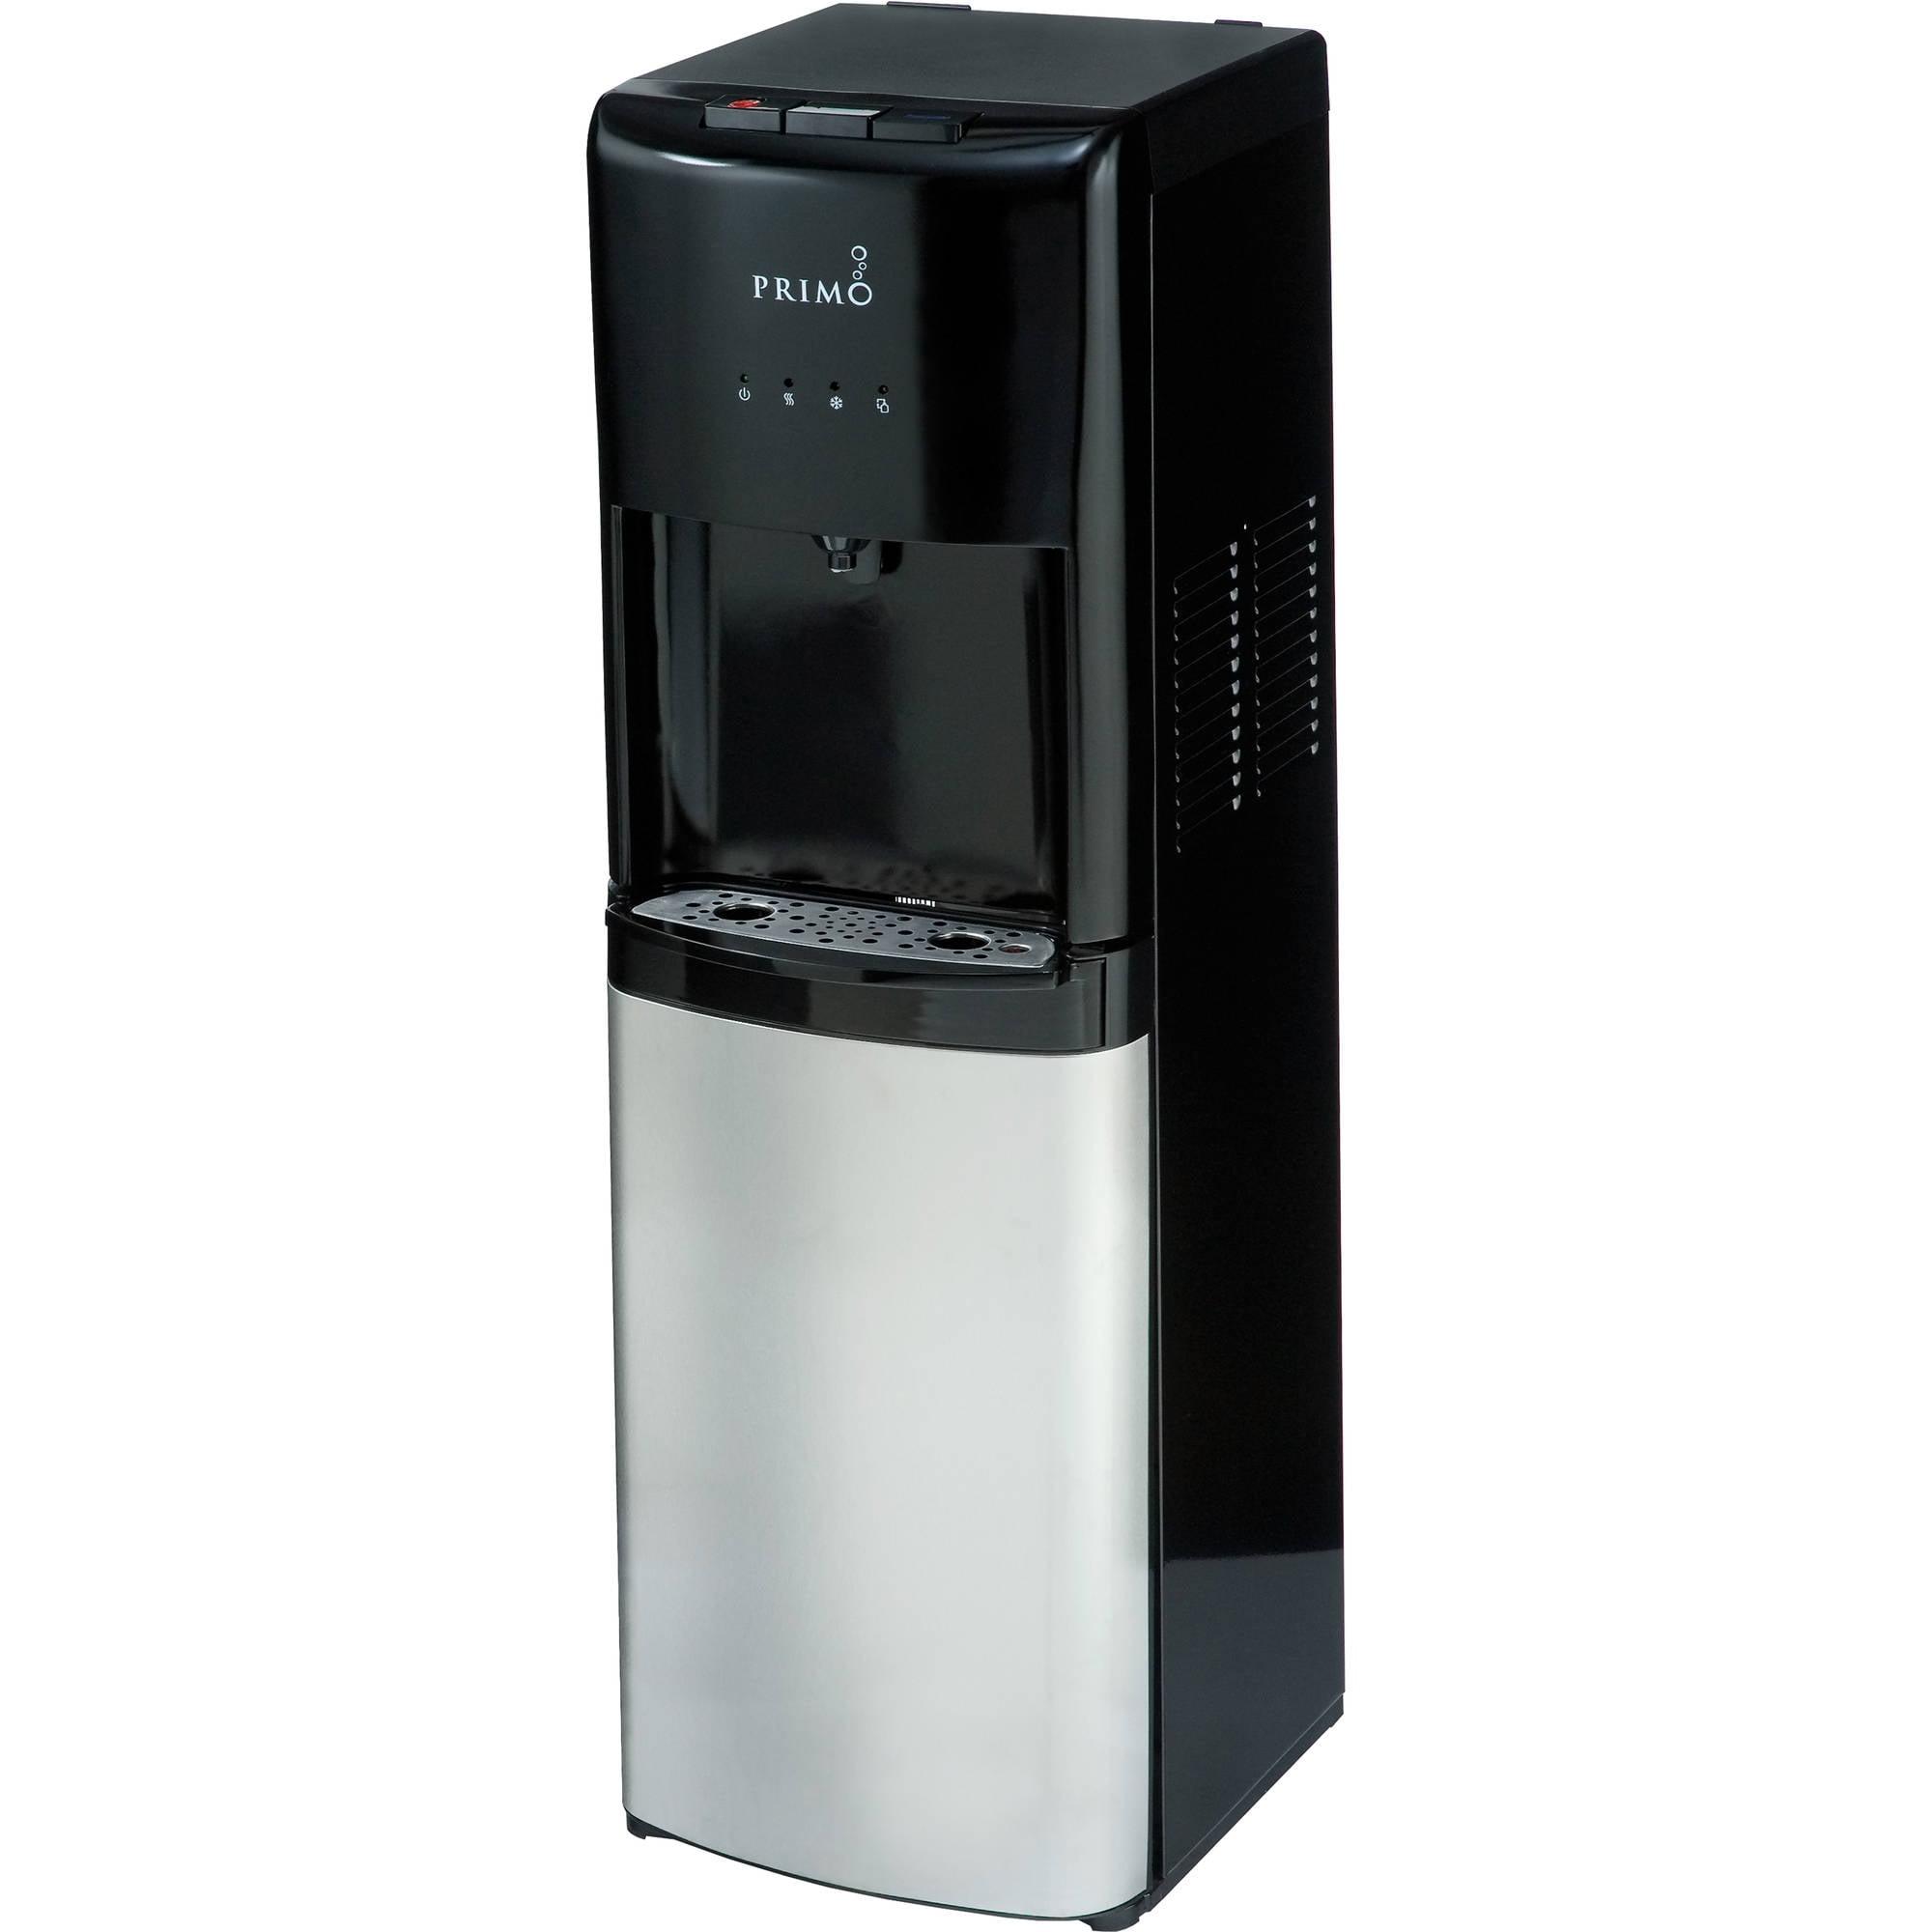 Filtered Water Dispenser Walmart Circleware Yorkshire